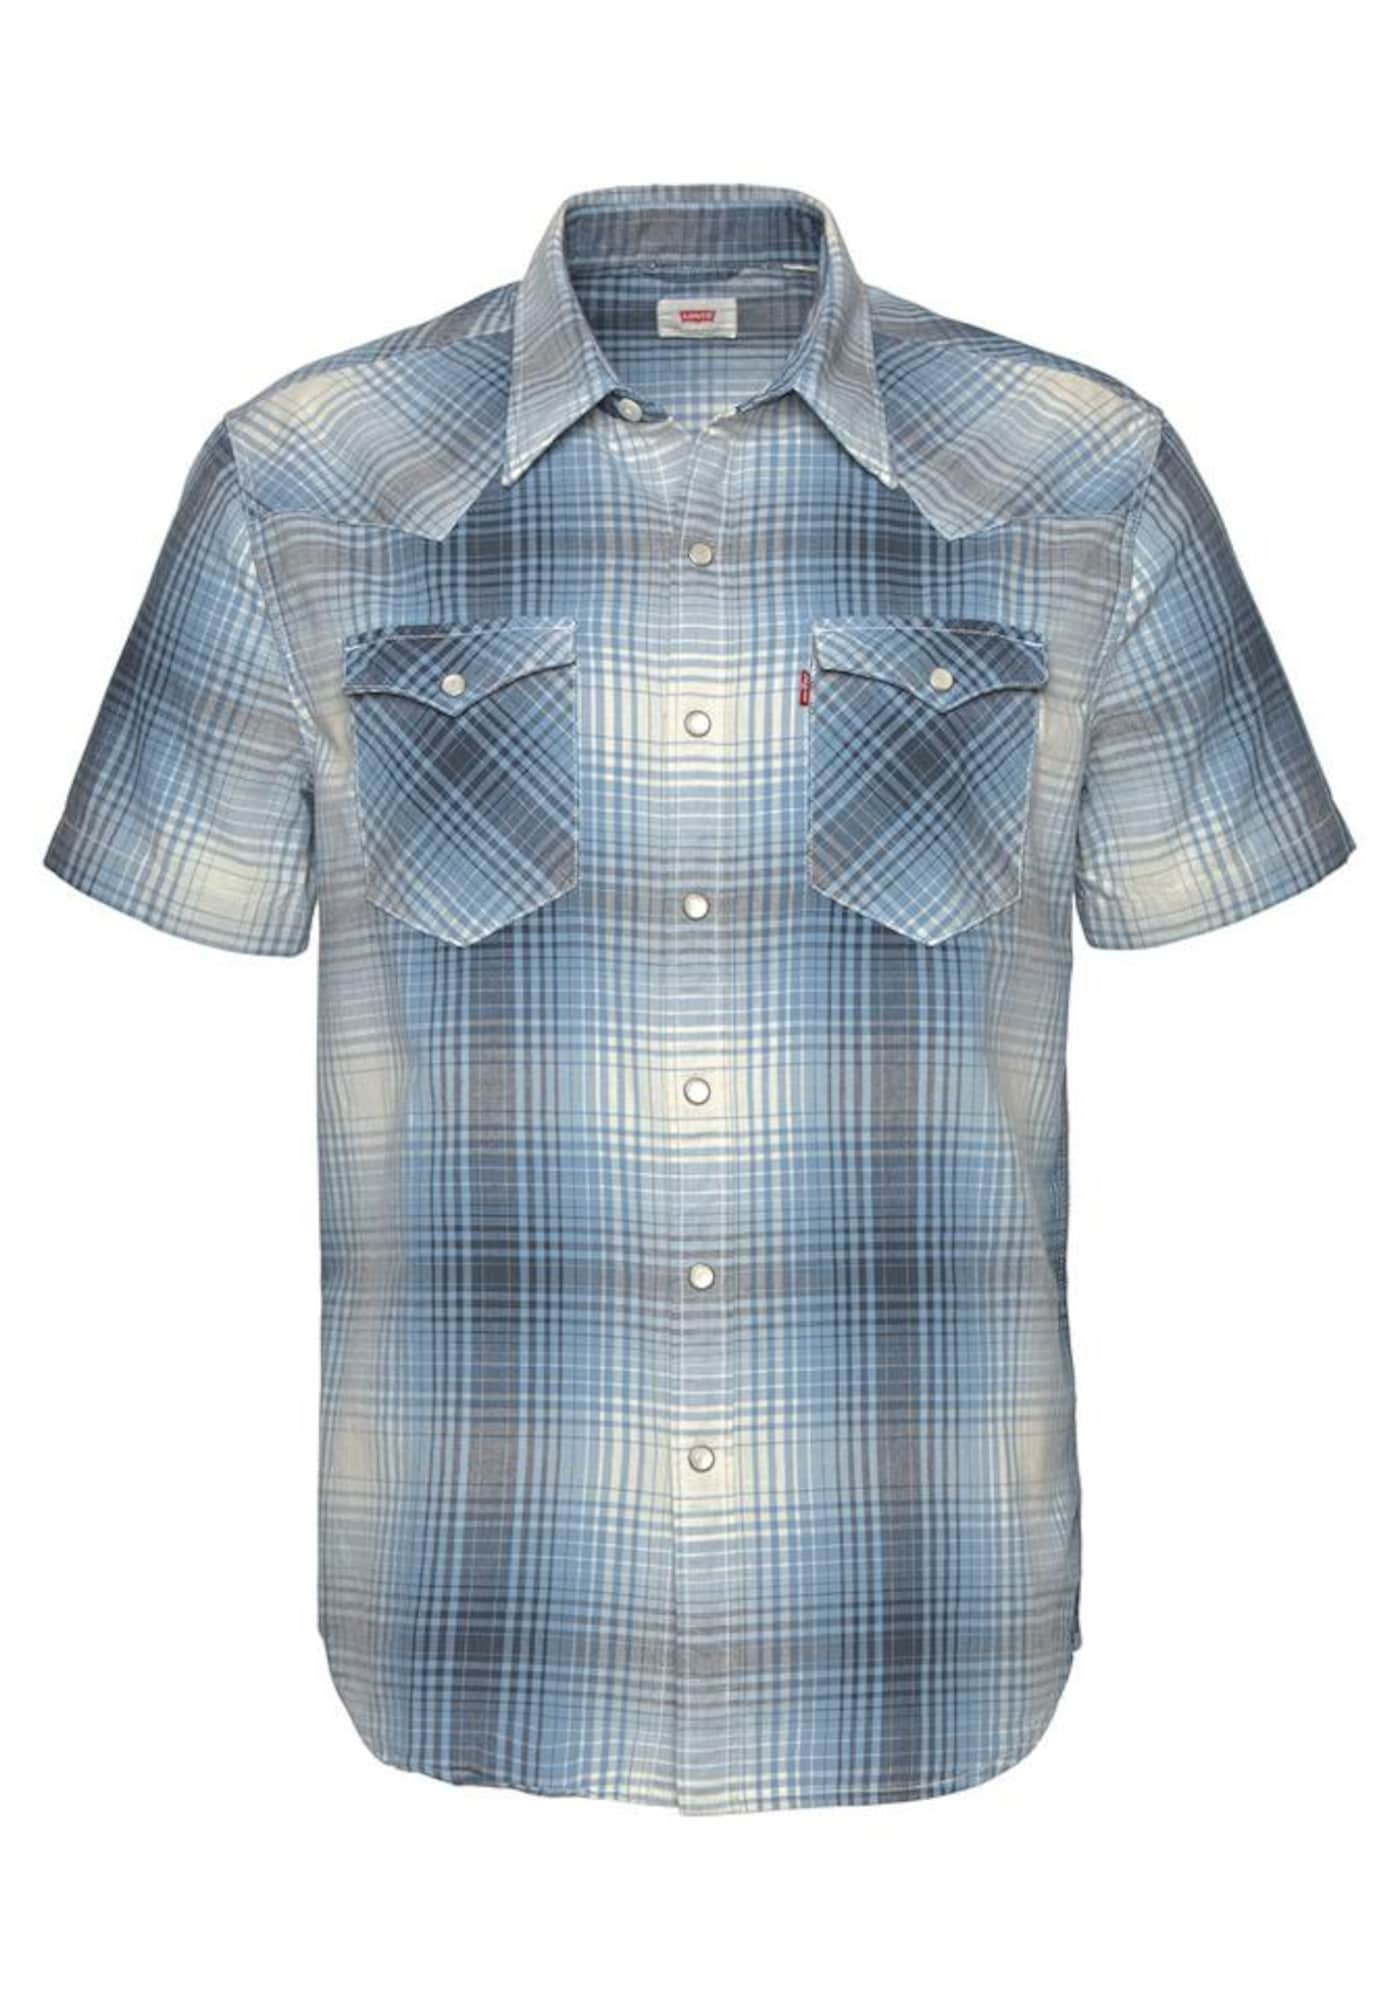 LEVI'S Heren Overhemd blauw